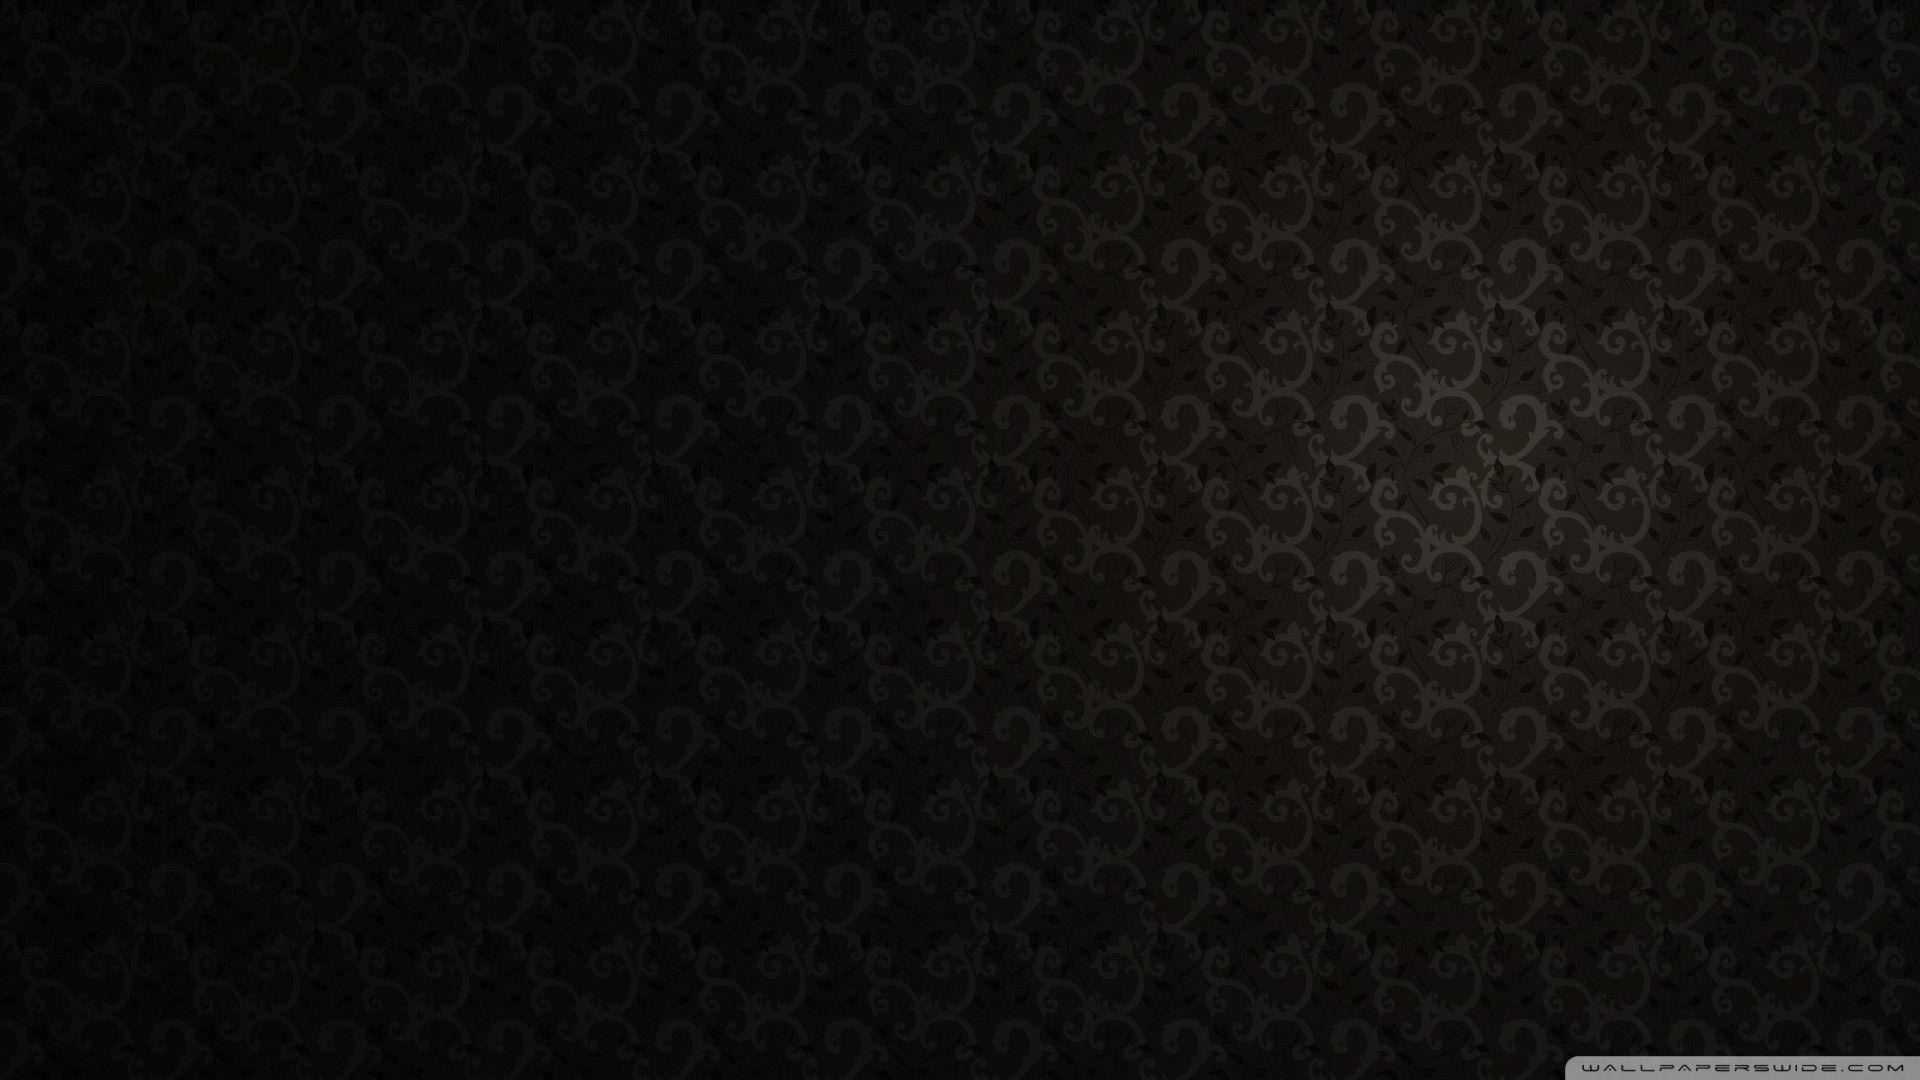 Wallpapers For > Elegant Wallpaper Pattern Black And White